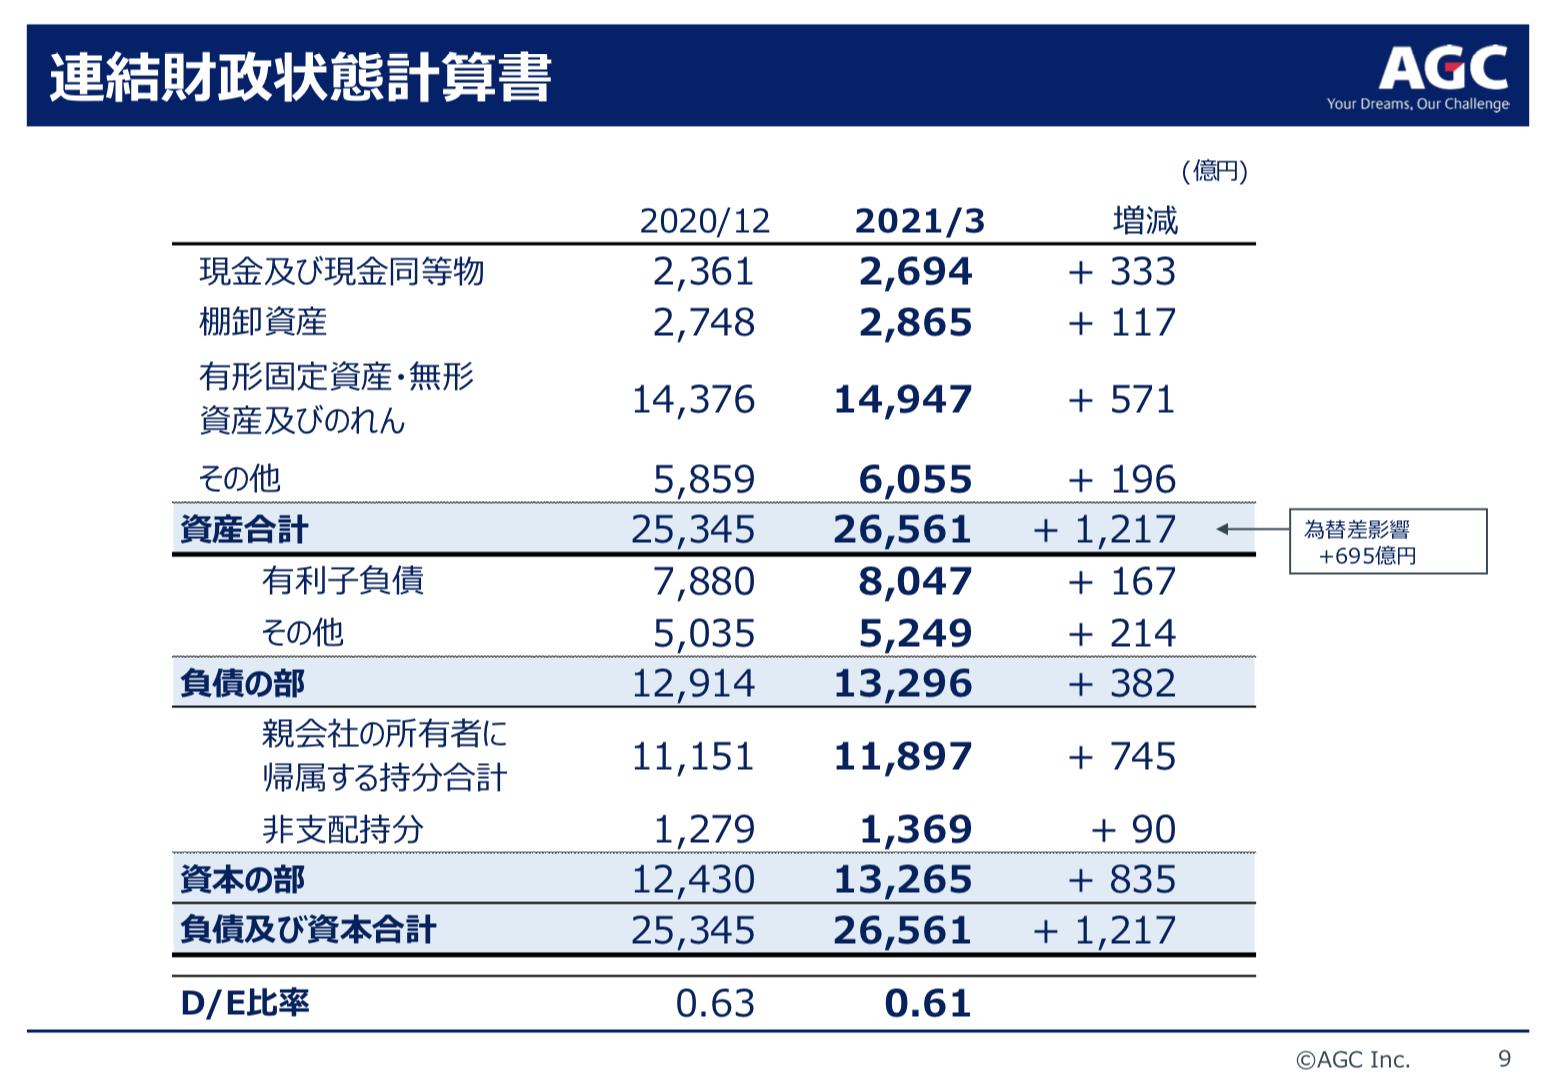 AGC(旧旭硝子) 2021年度1Q決算を徹底解説! さとり世代の株日記 資産運用 株 投資 資産形成